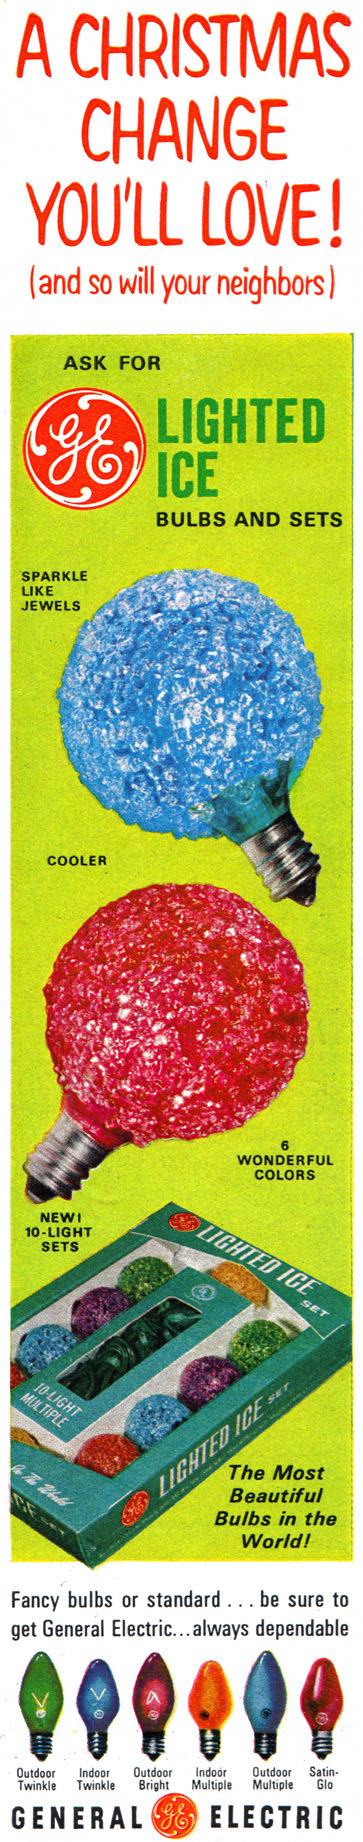 General Electric - 1966